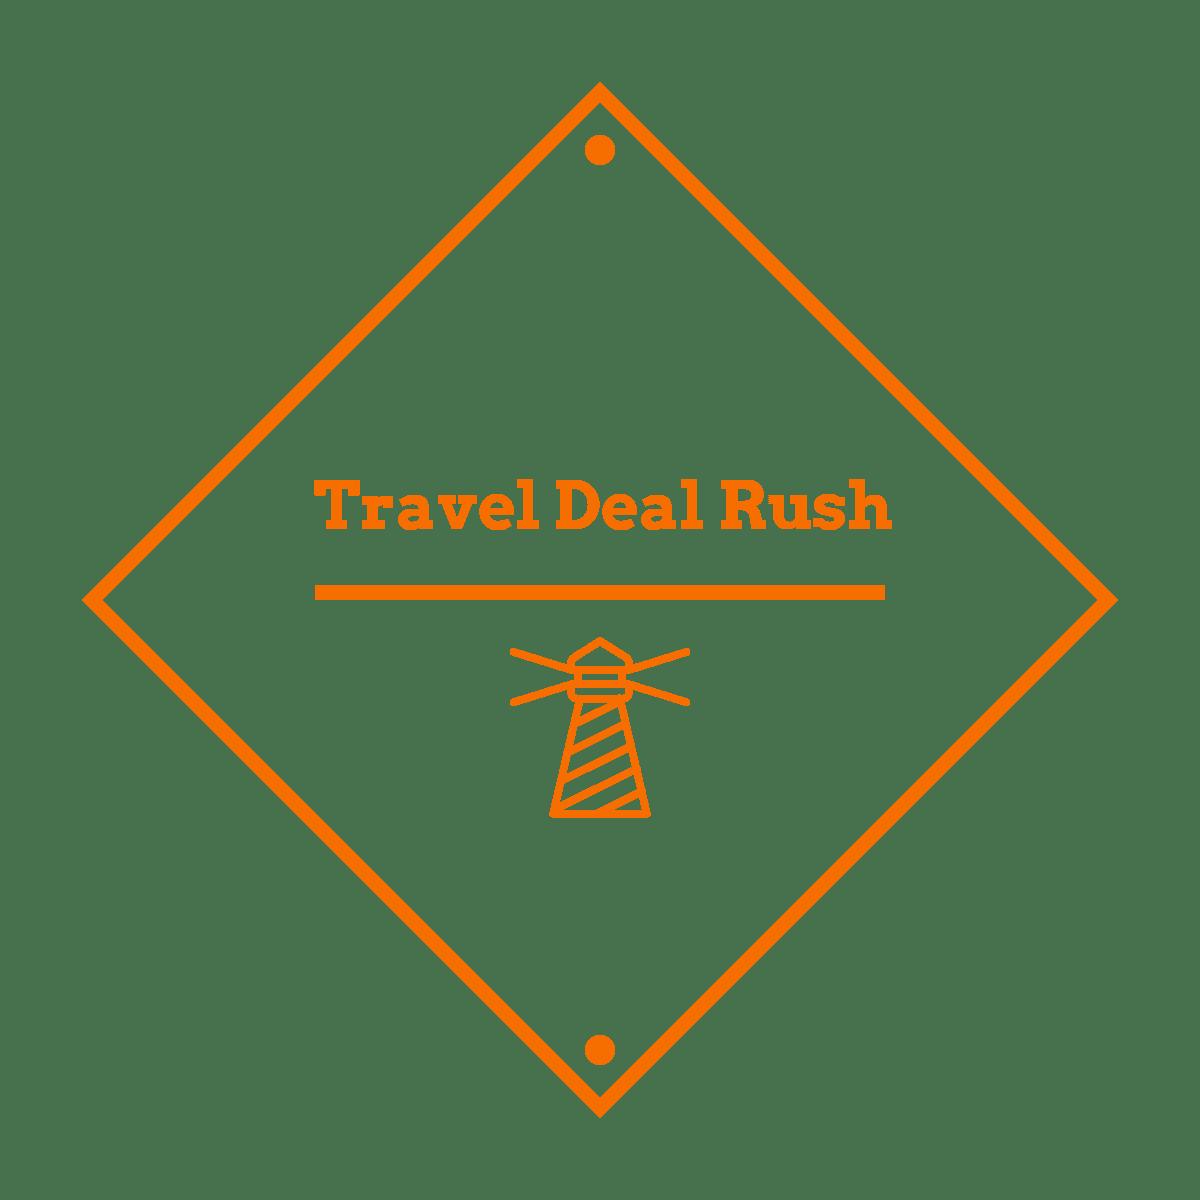 Travel Deal Rush